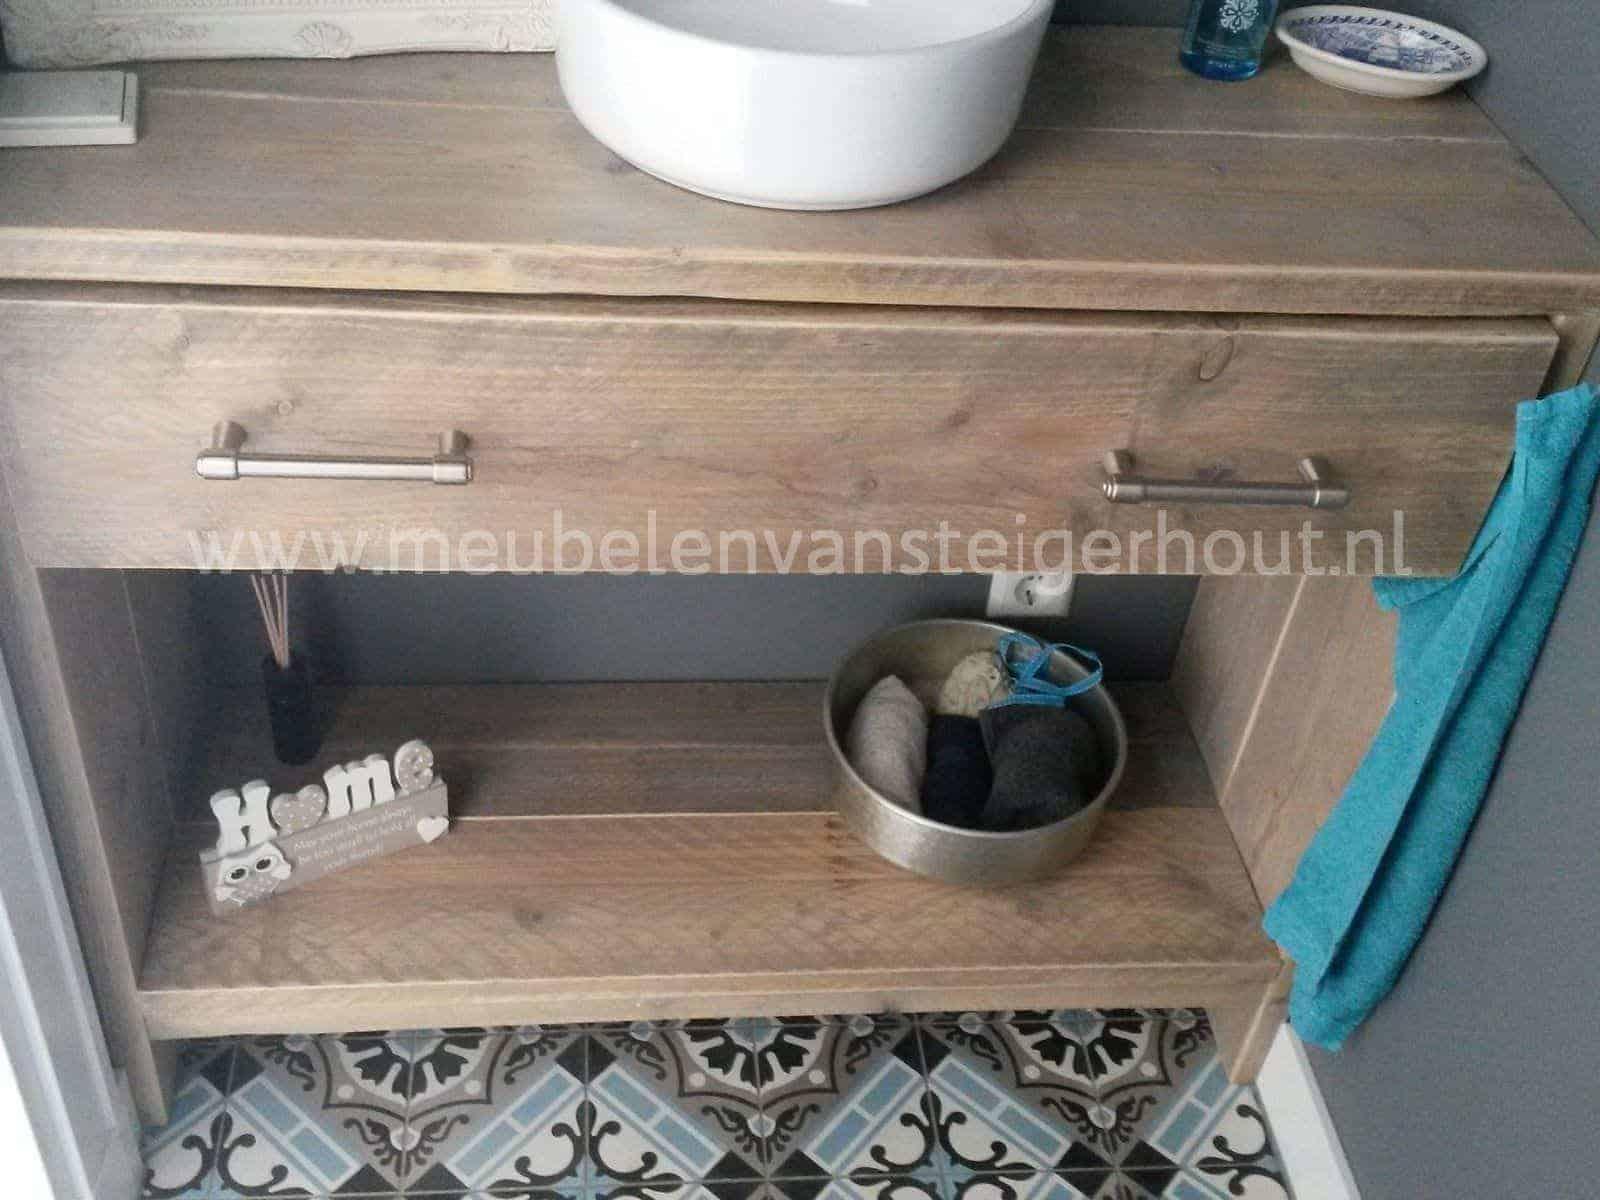 steigerhout badkamermeubel type 6 meubelen van steigerhout